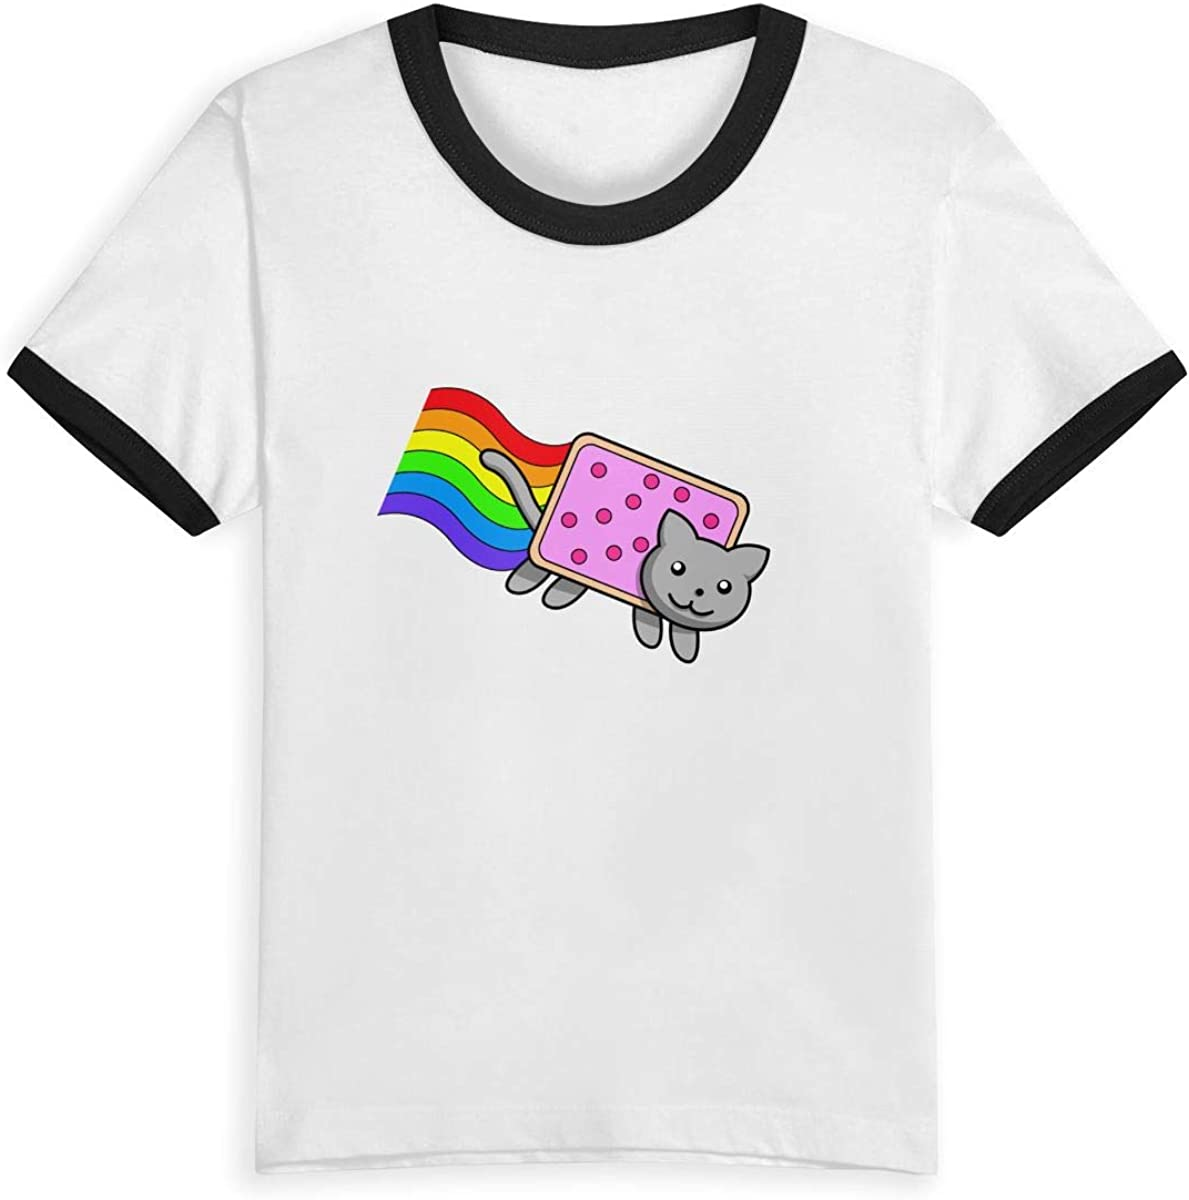 Kids Rainbow Nyan Cat O-Neck T Shirts for Fashion Children Boys Girls Tee Shirt